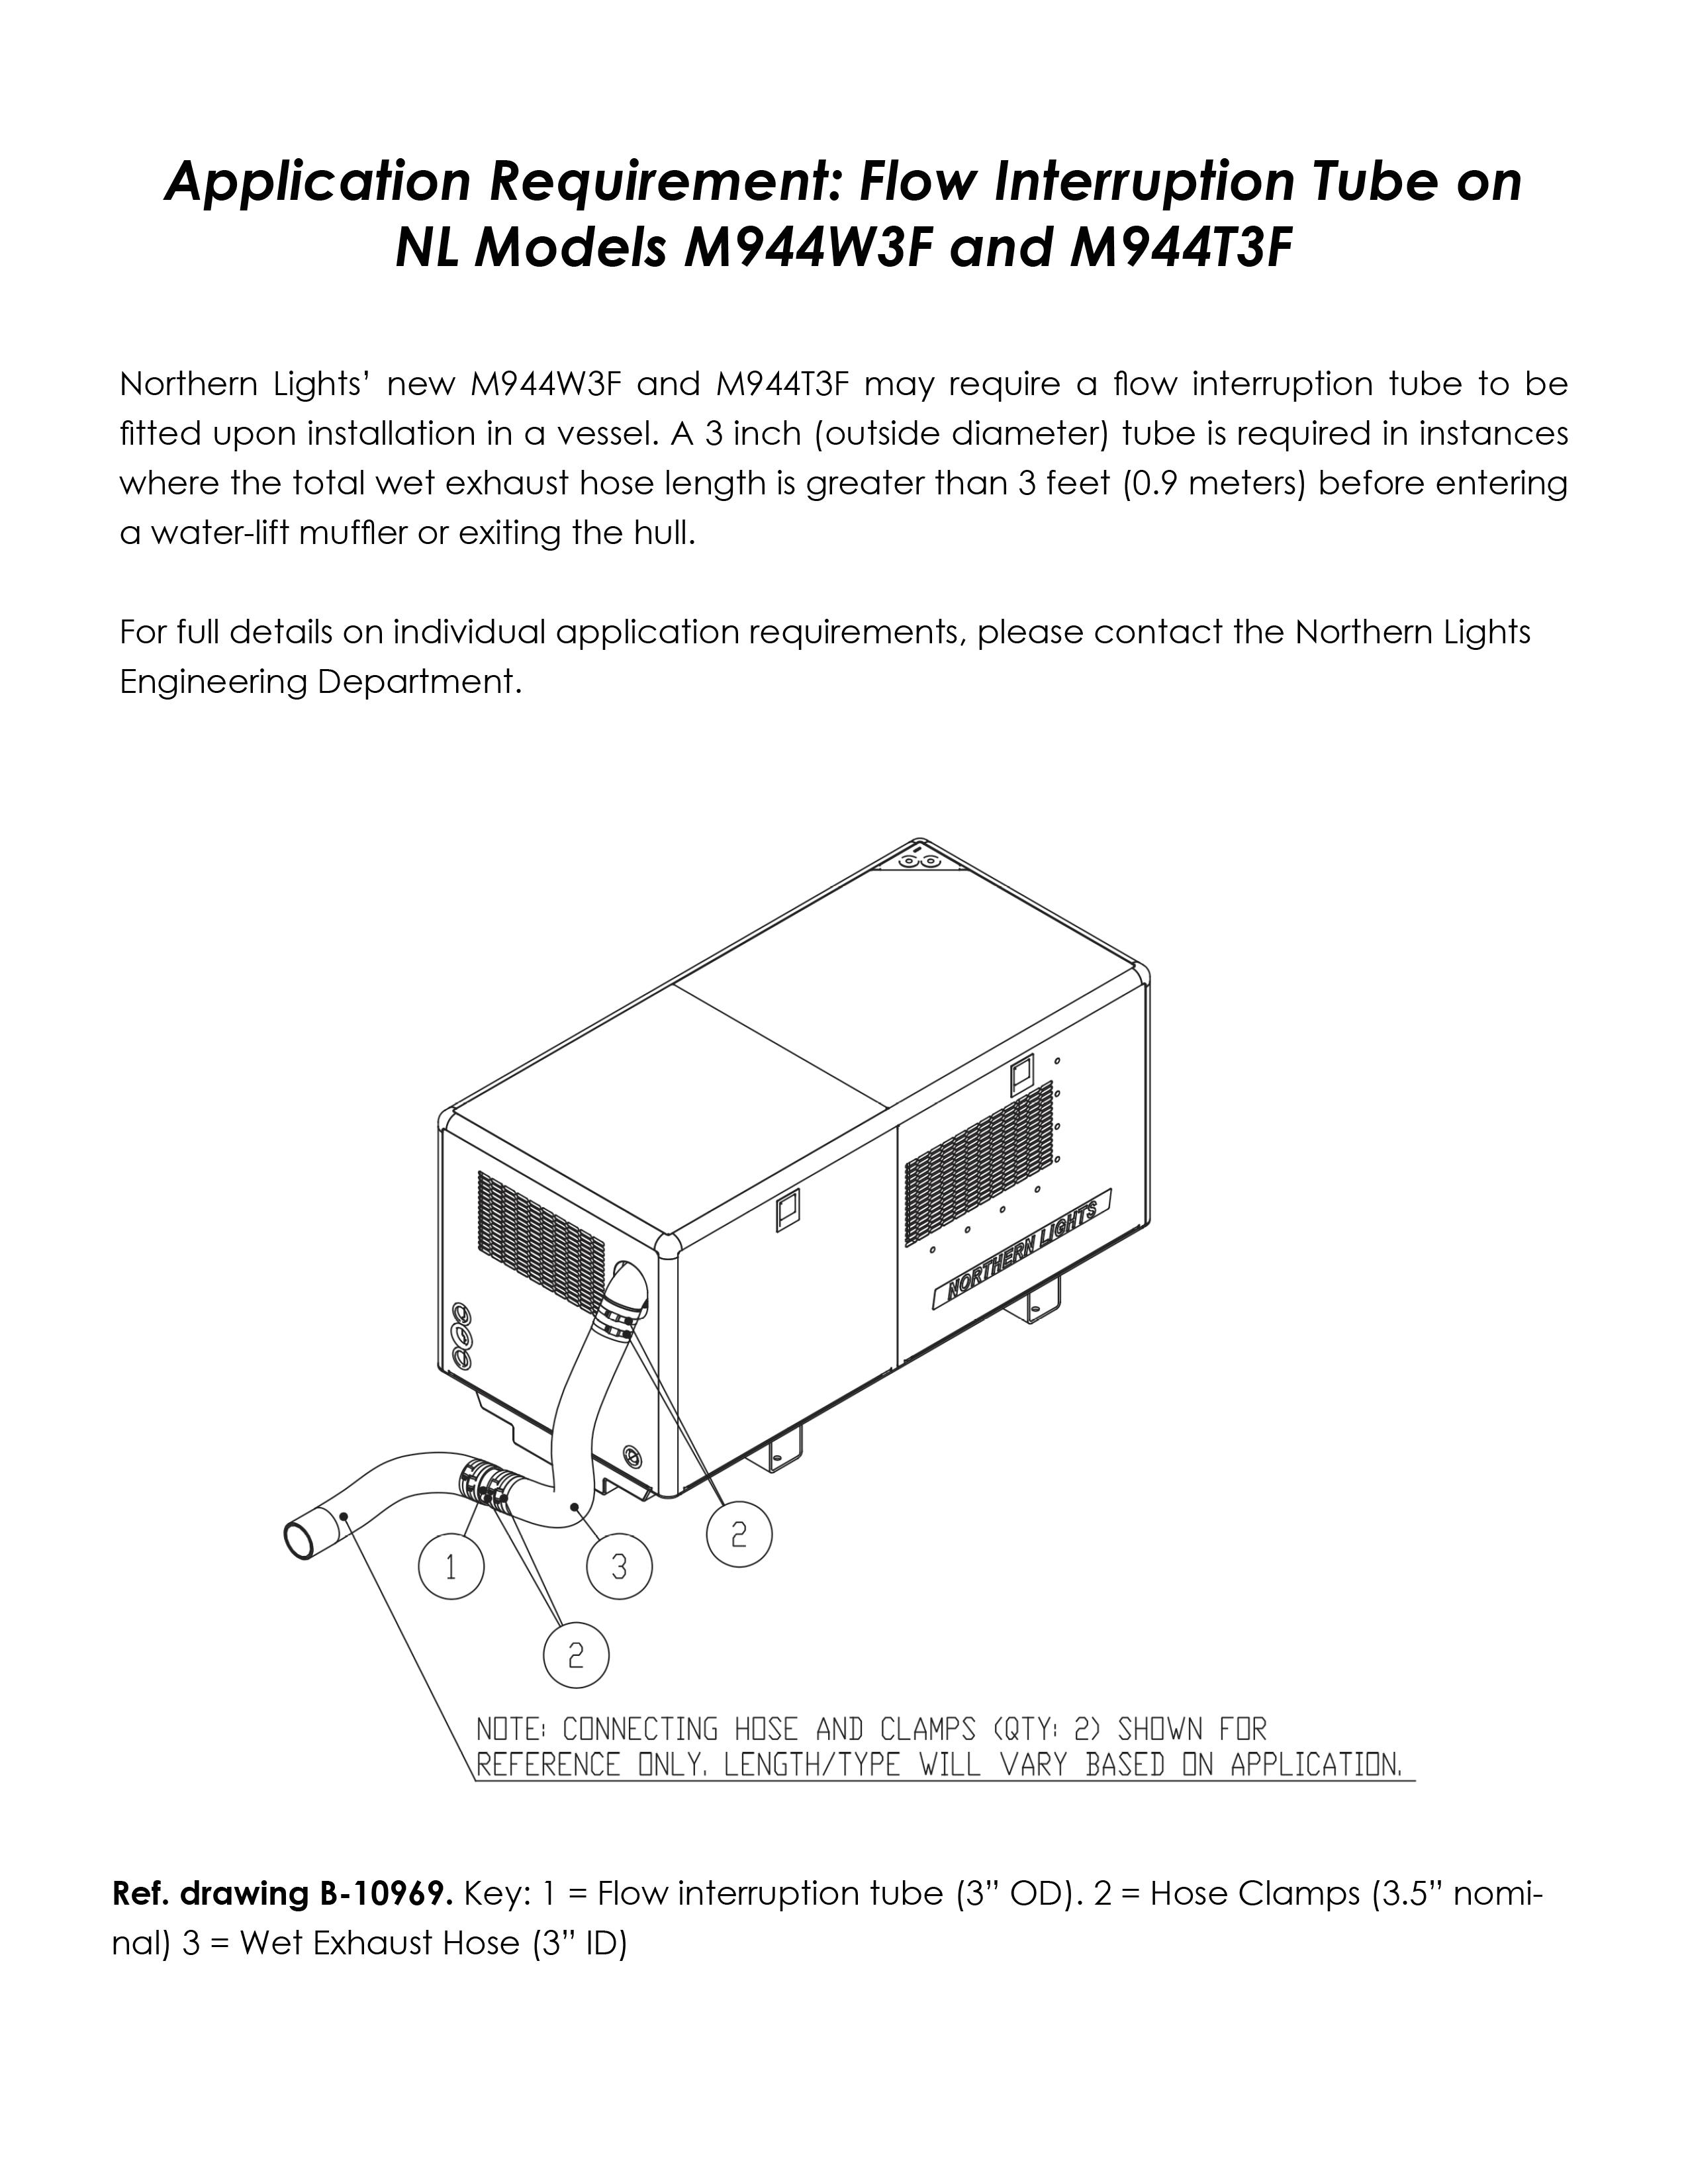 installation notice